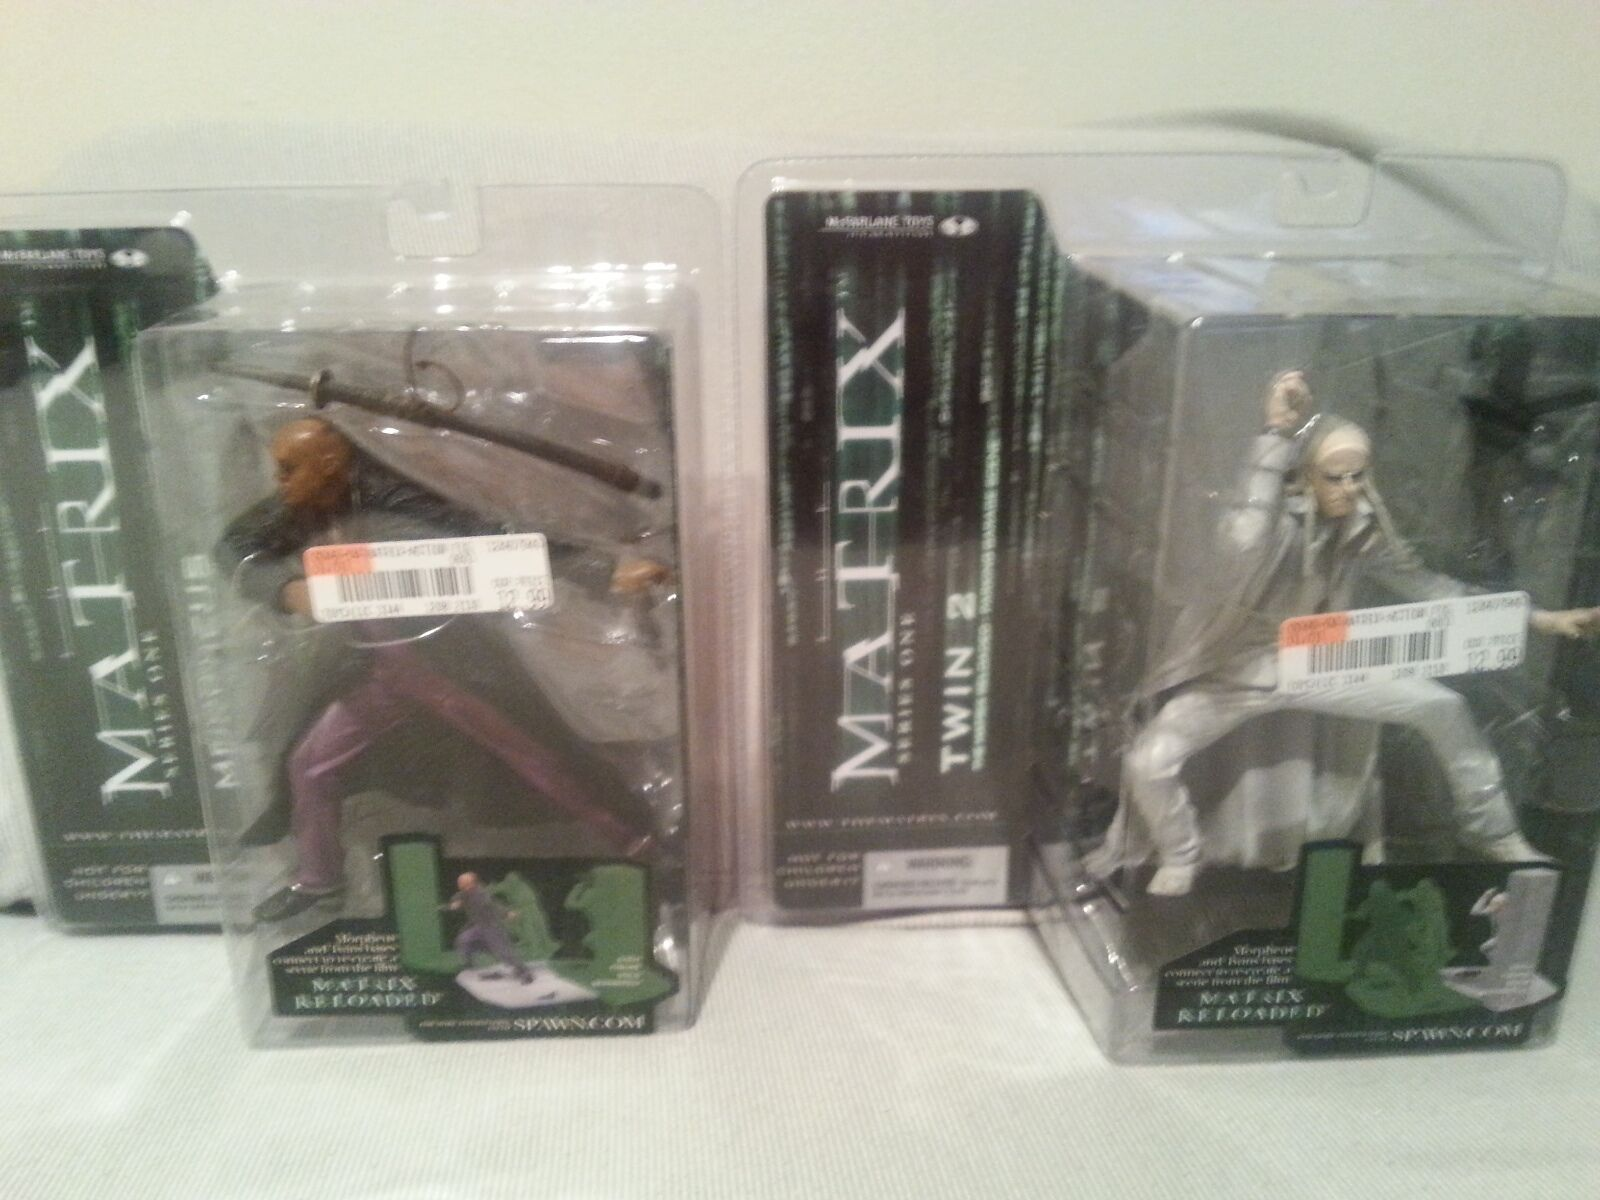 Matrix Reloaded McFarlane McFarlane McFarlane Series 1 Twin 2 and Morpheus Figures 869138